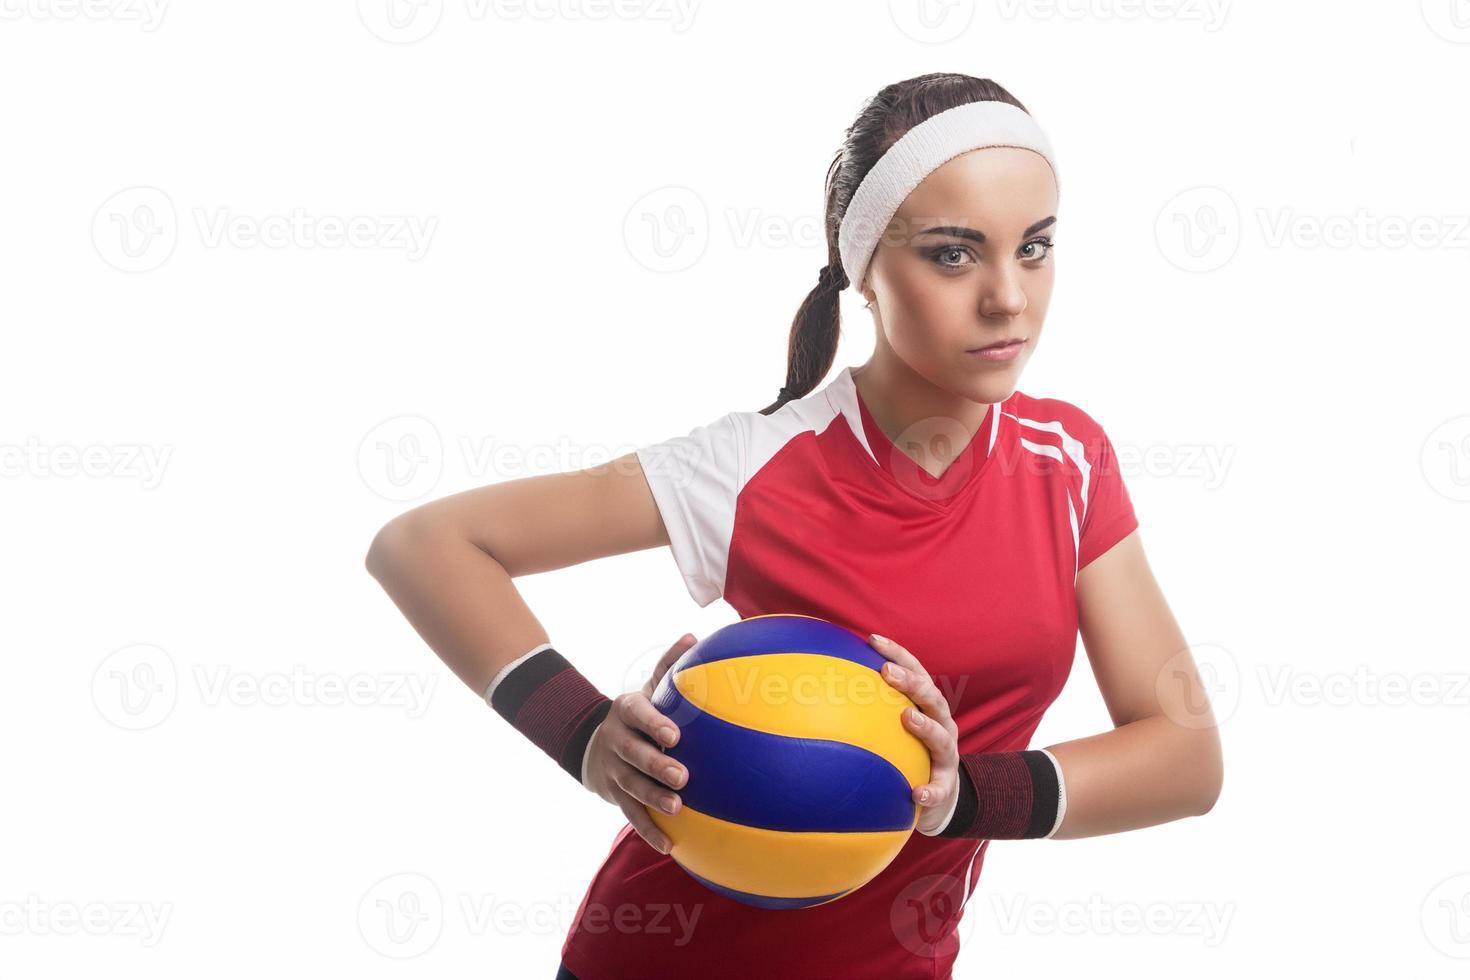 sterke wil blanke professionele vrouwelijke volleyballer uitgerust in volleybal outfit foto